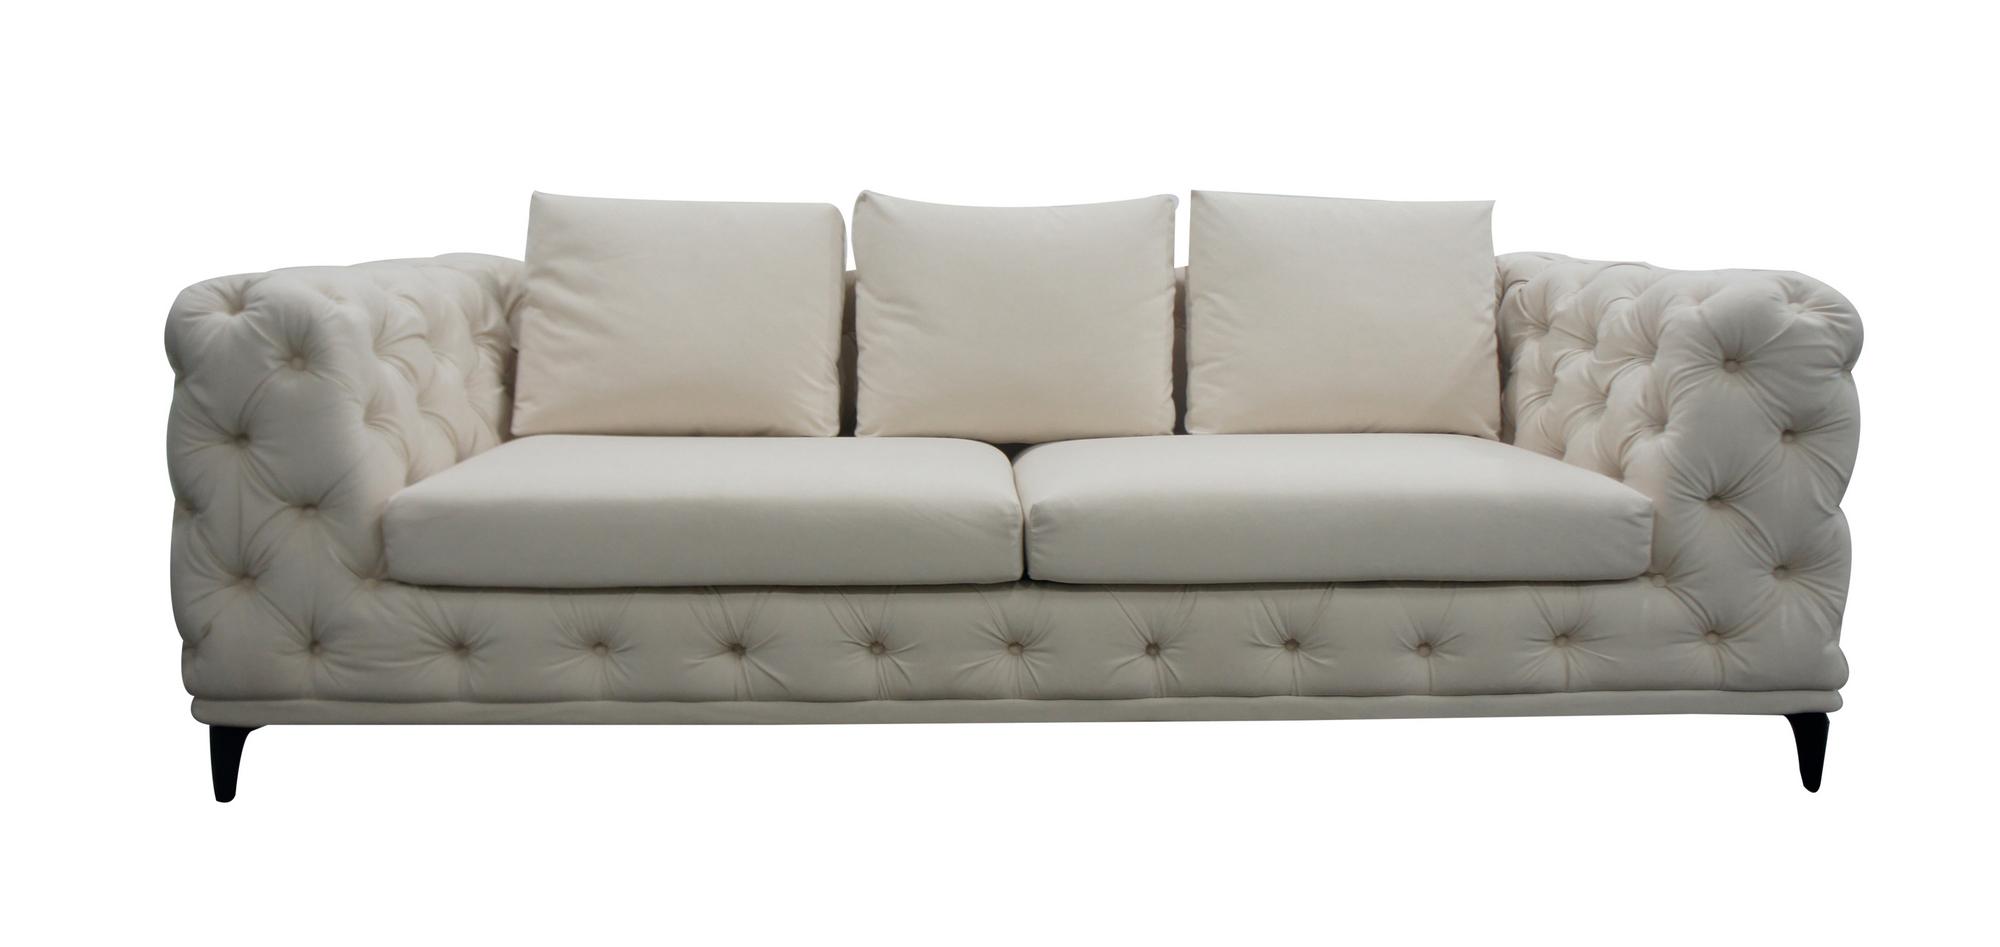 VIG Furniture Divani Casa Werner Modern White Velvet Sofa